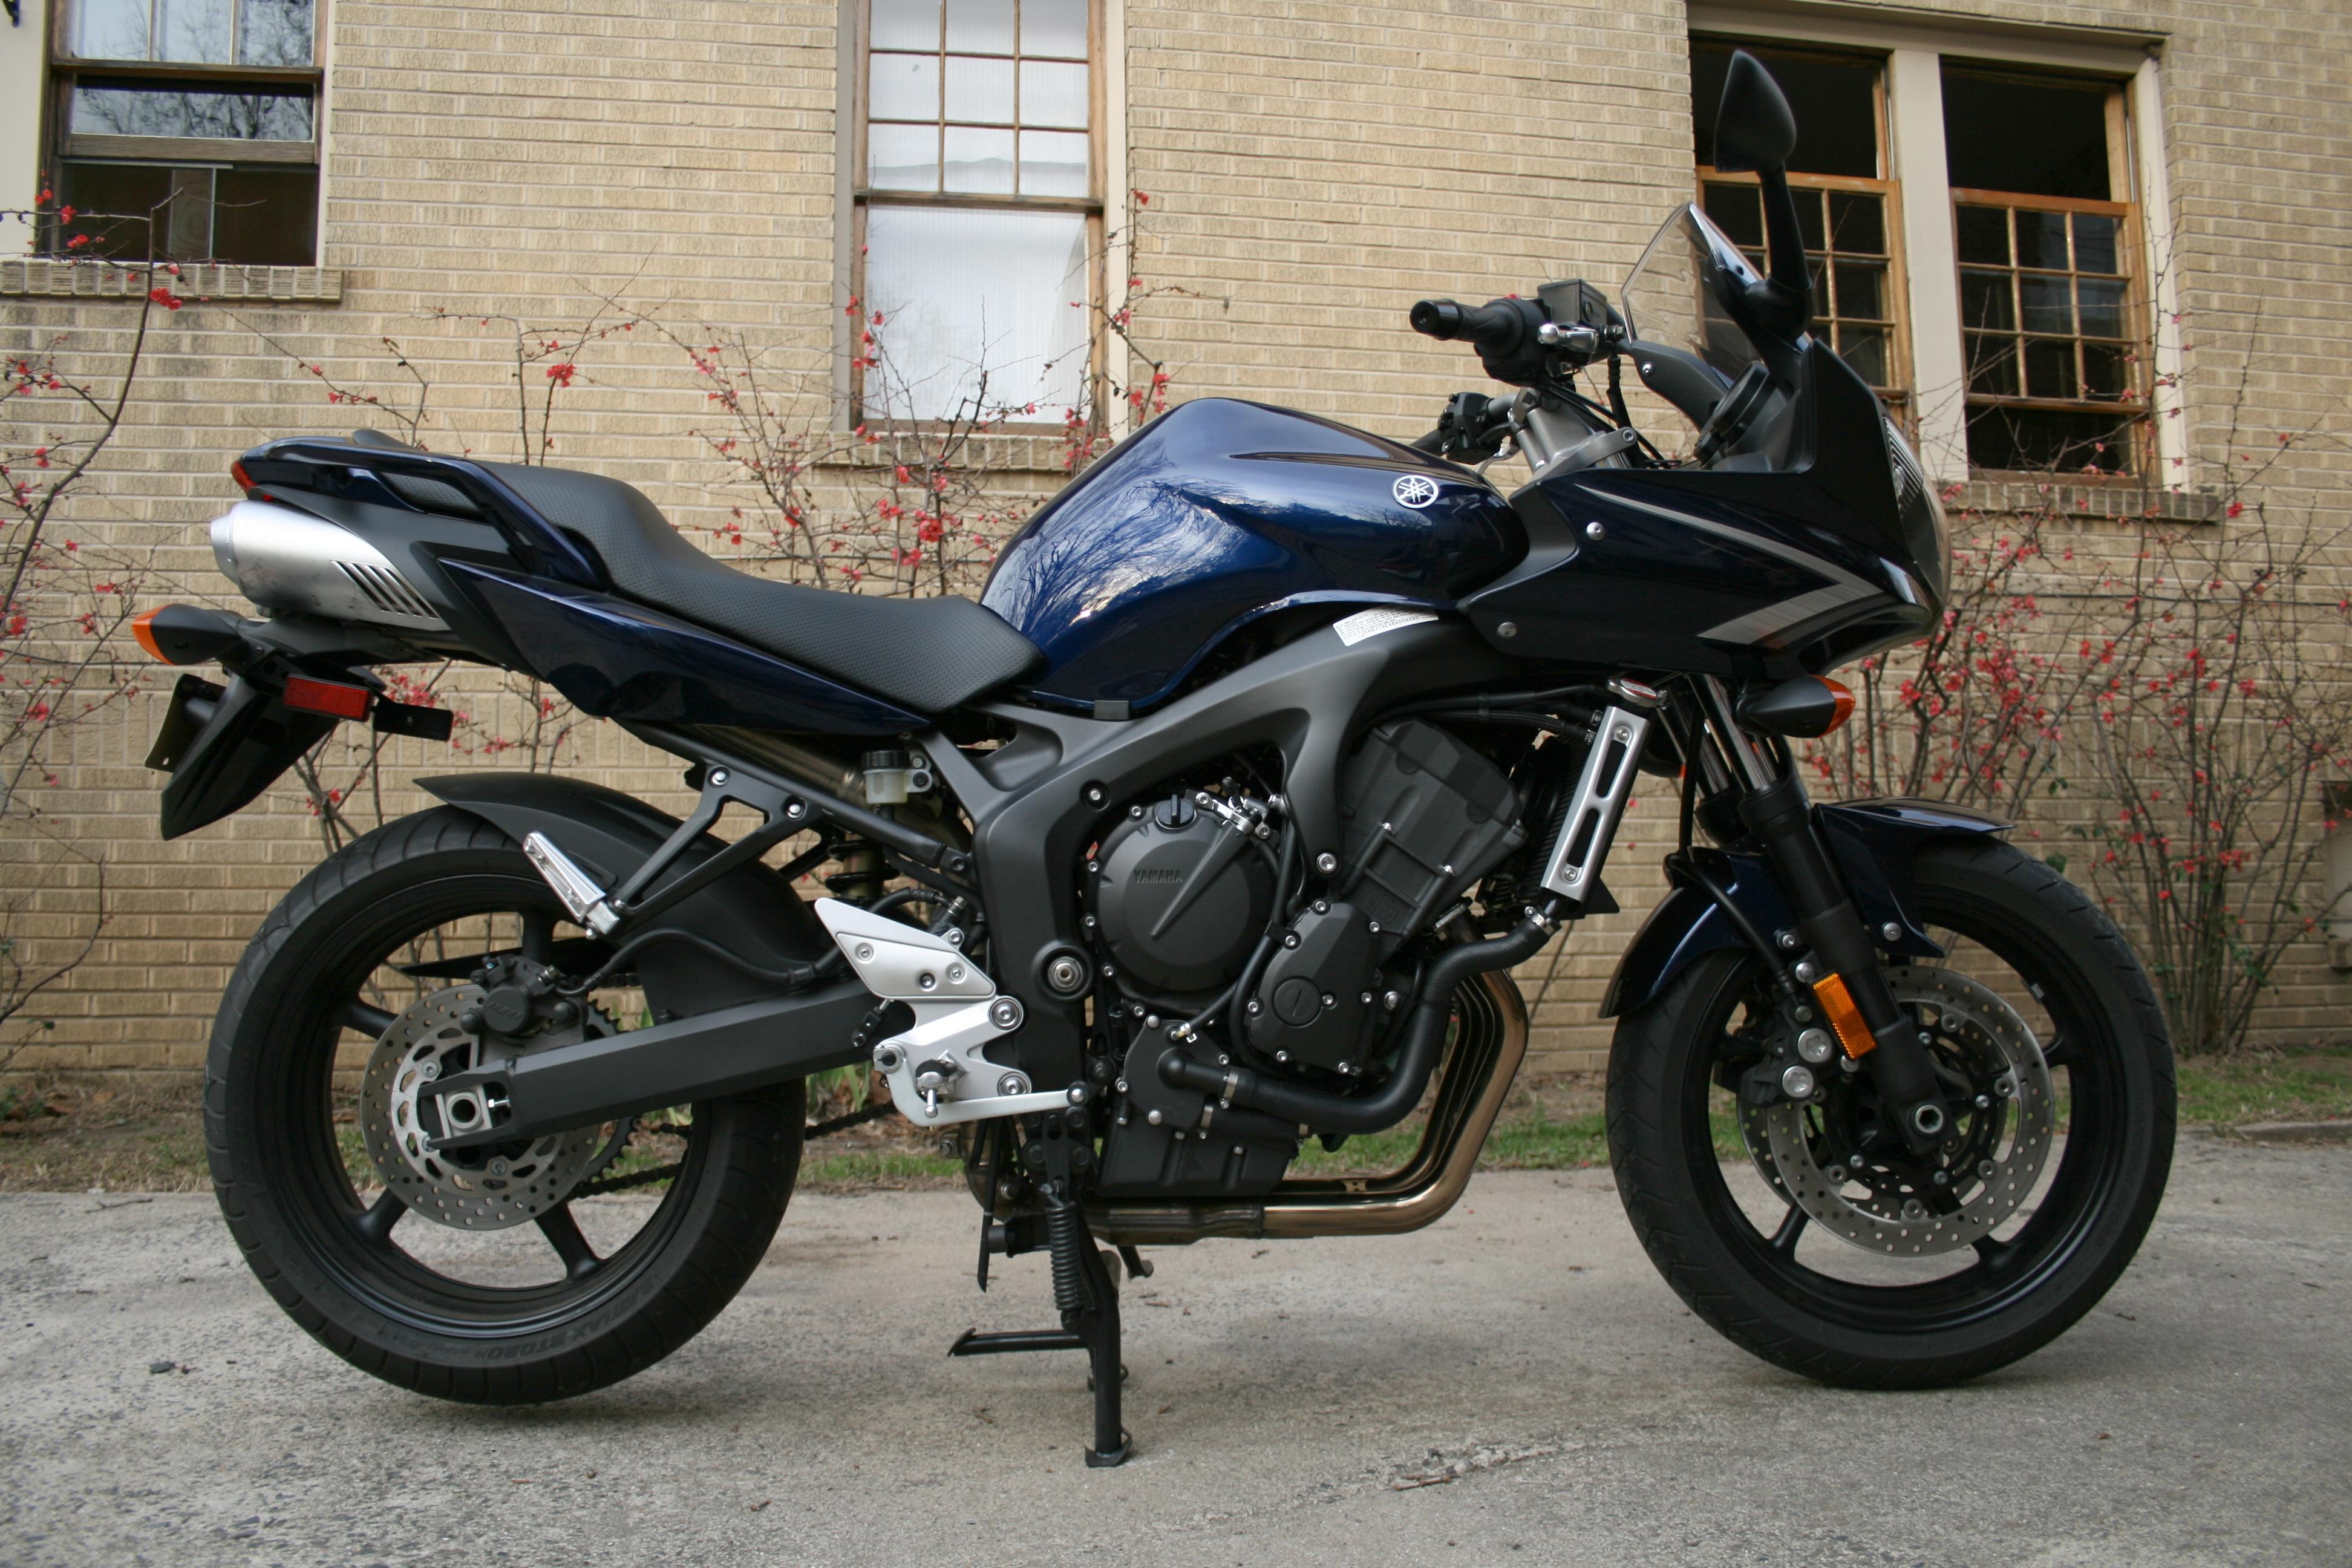 Help 07 Kawi Er 6n 650r Vs 06 Yamaha Fz6 Motorcycles